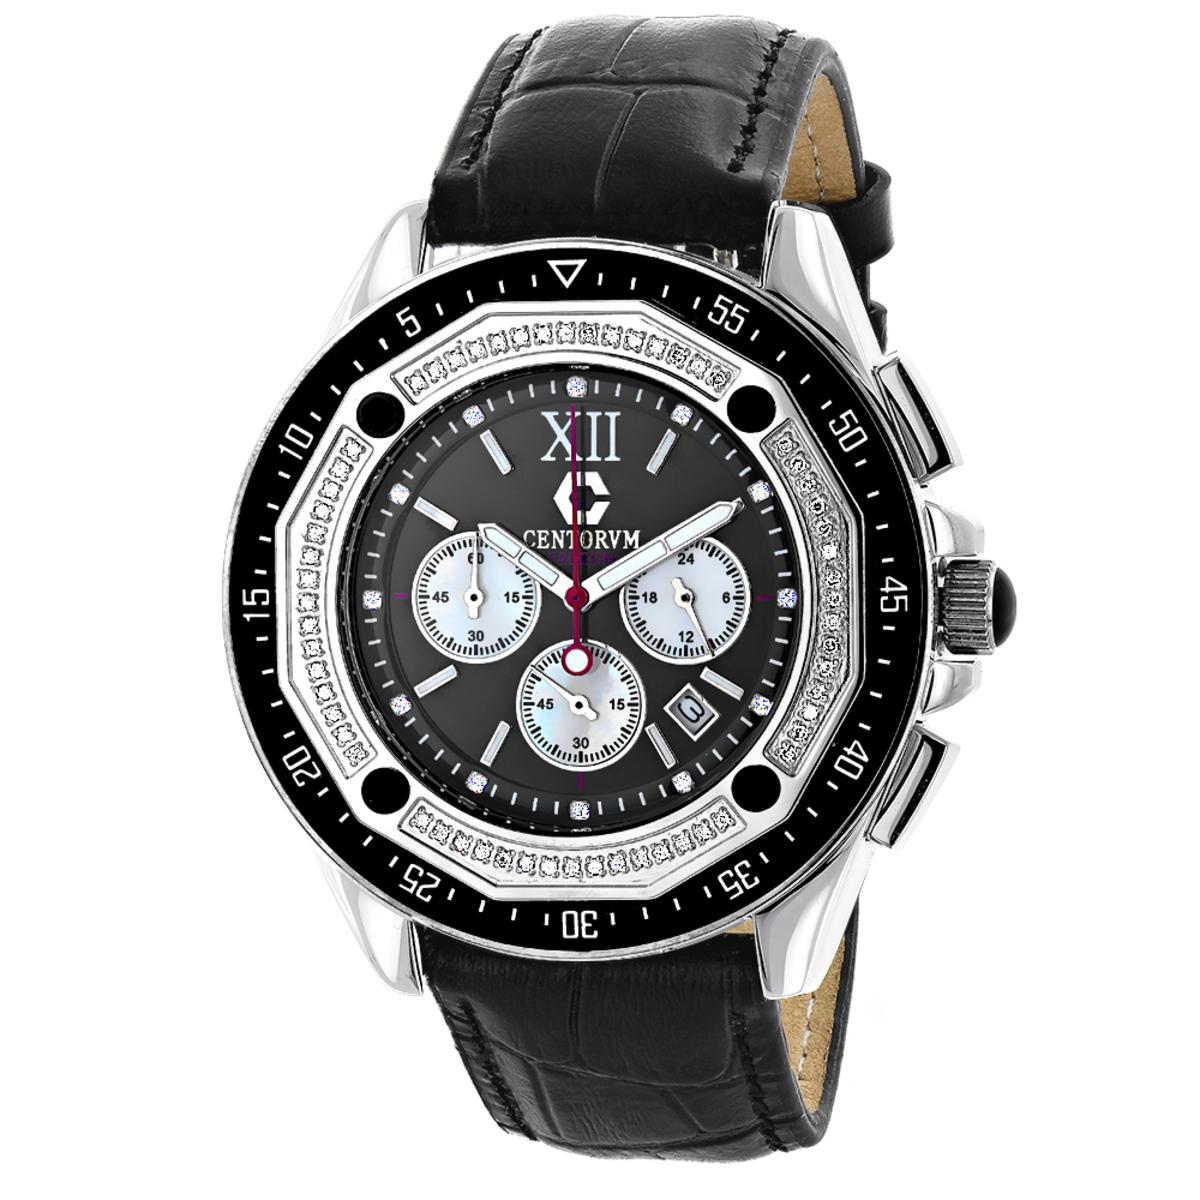 Diamond Watches For Men: Centorum Falcon 0.55ct